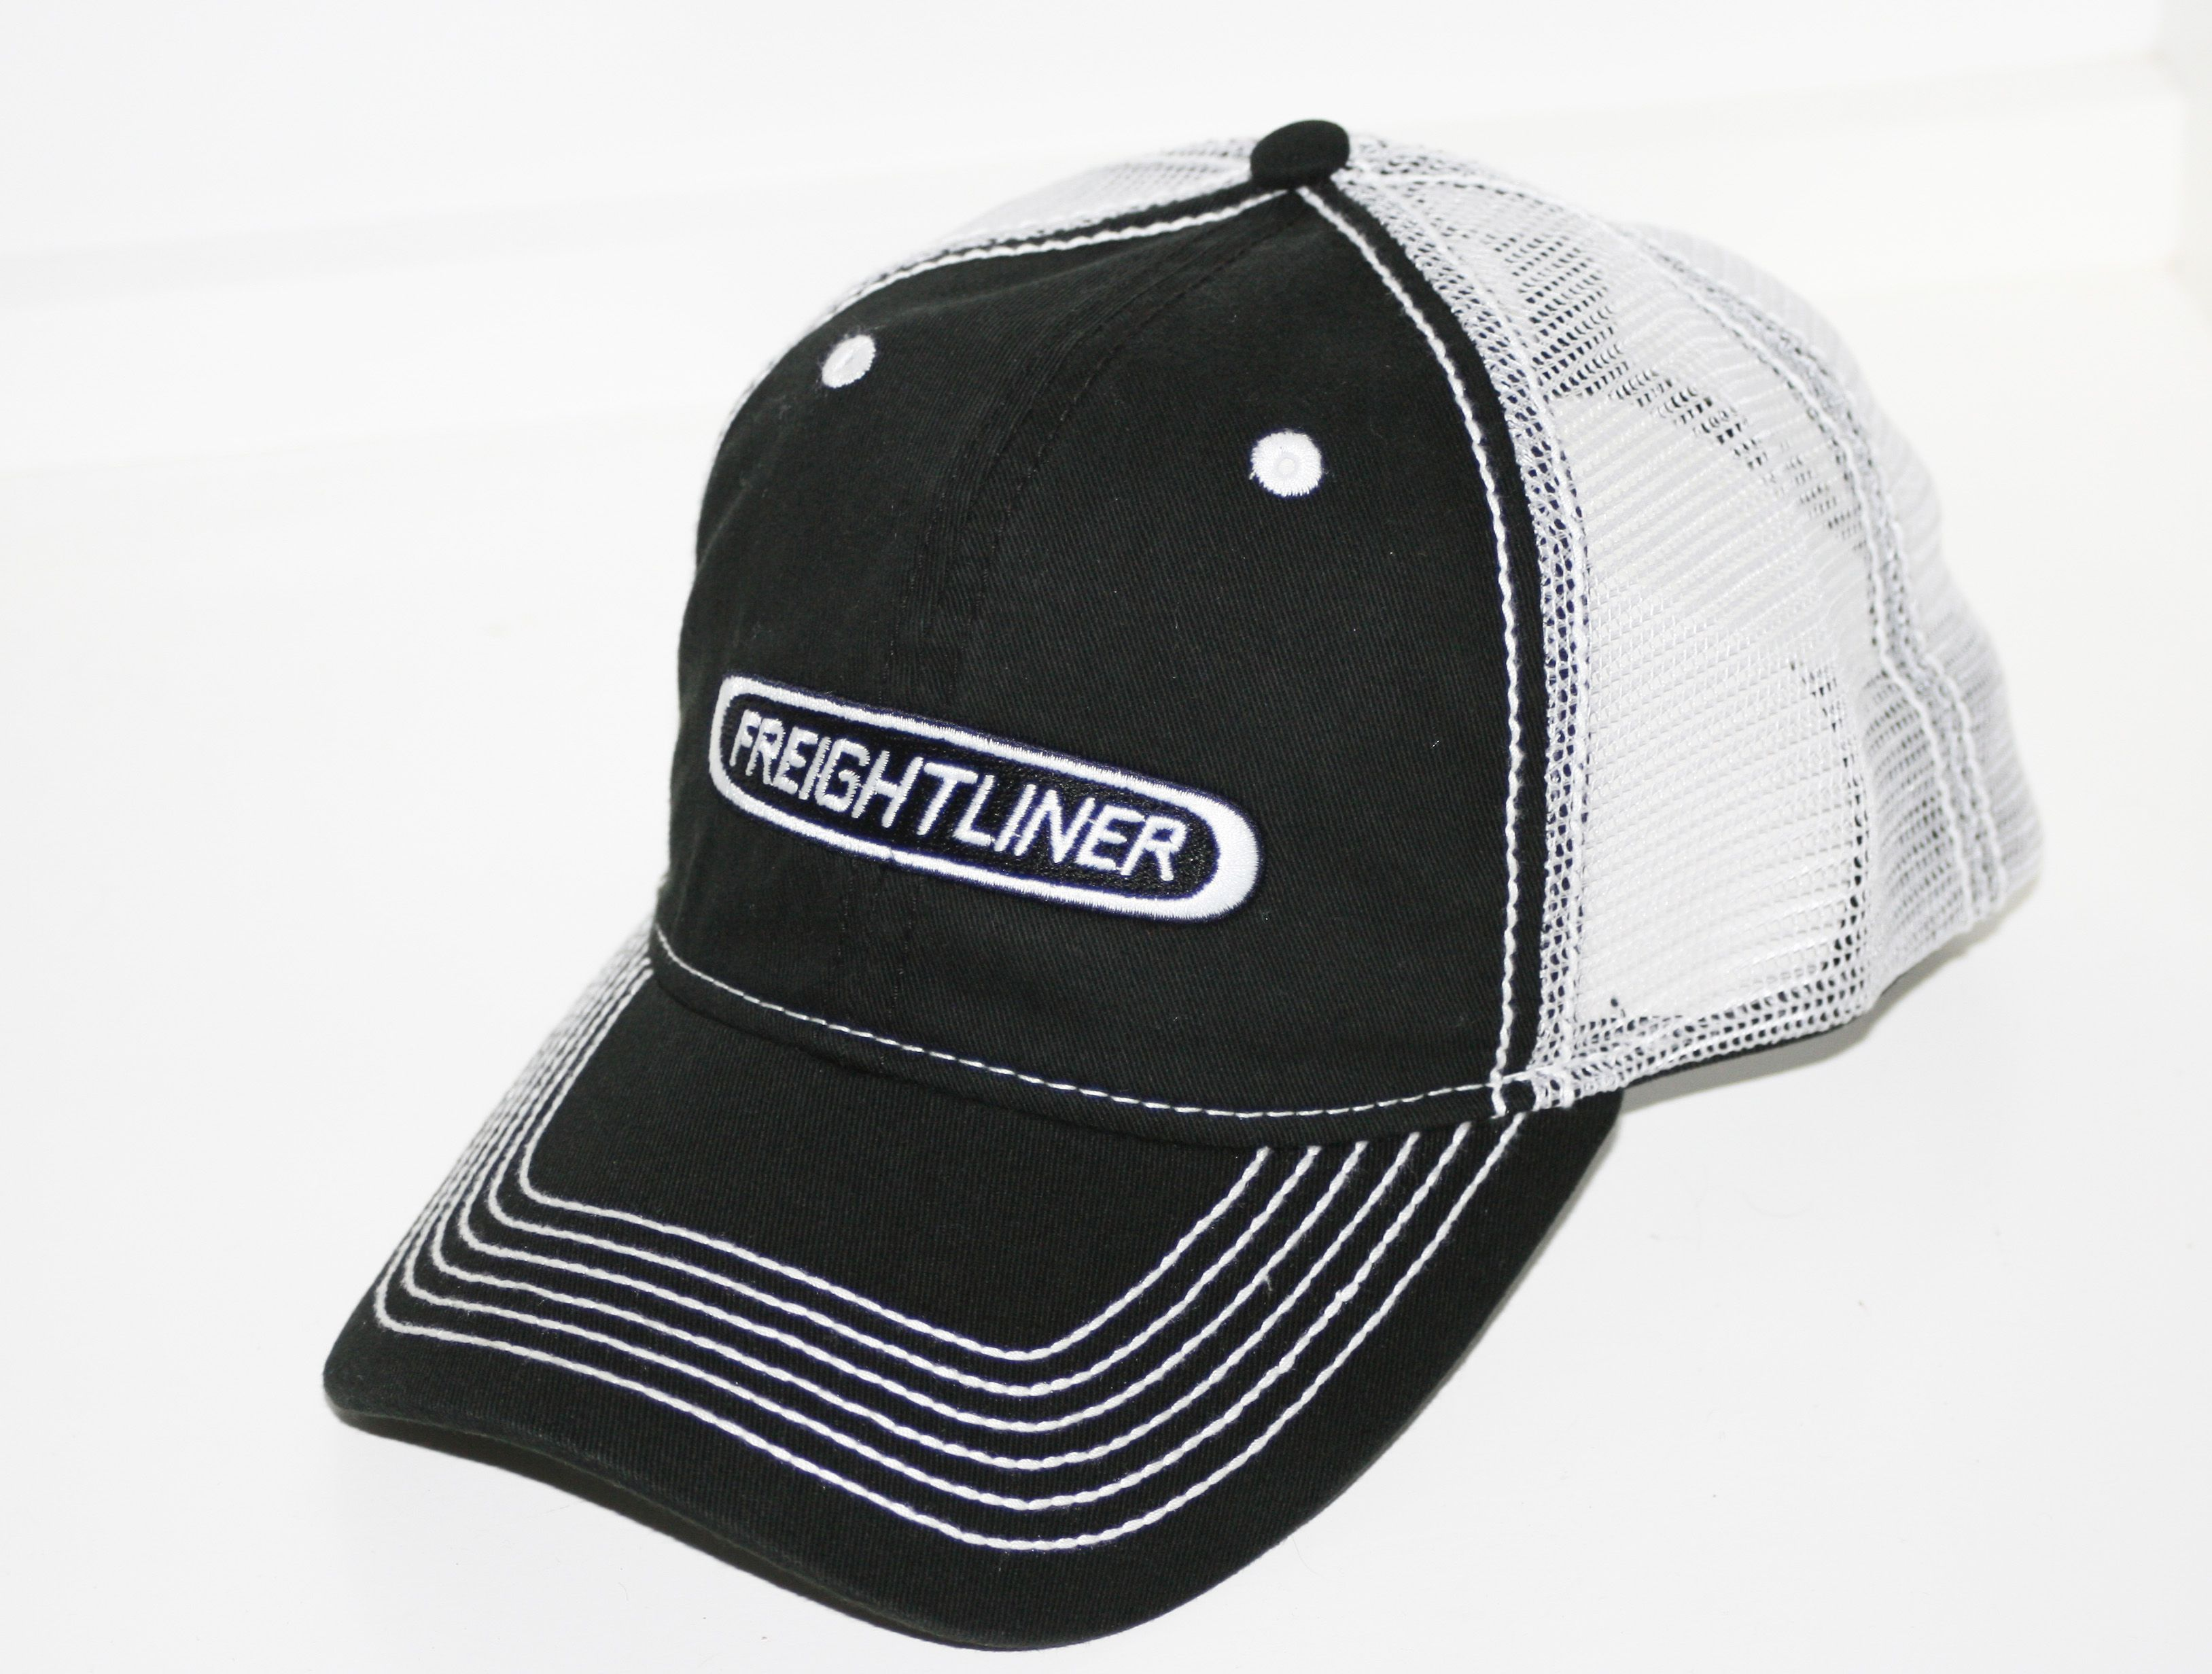 7e327653a Freightliner Merchandise - Freightliner Mesh Back Black Hats ...